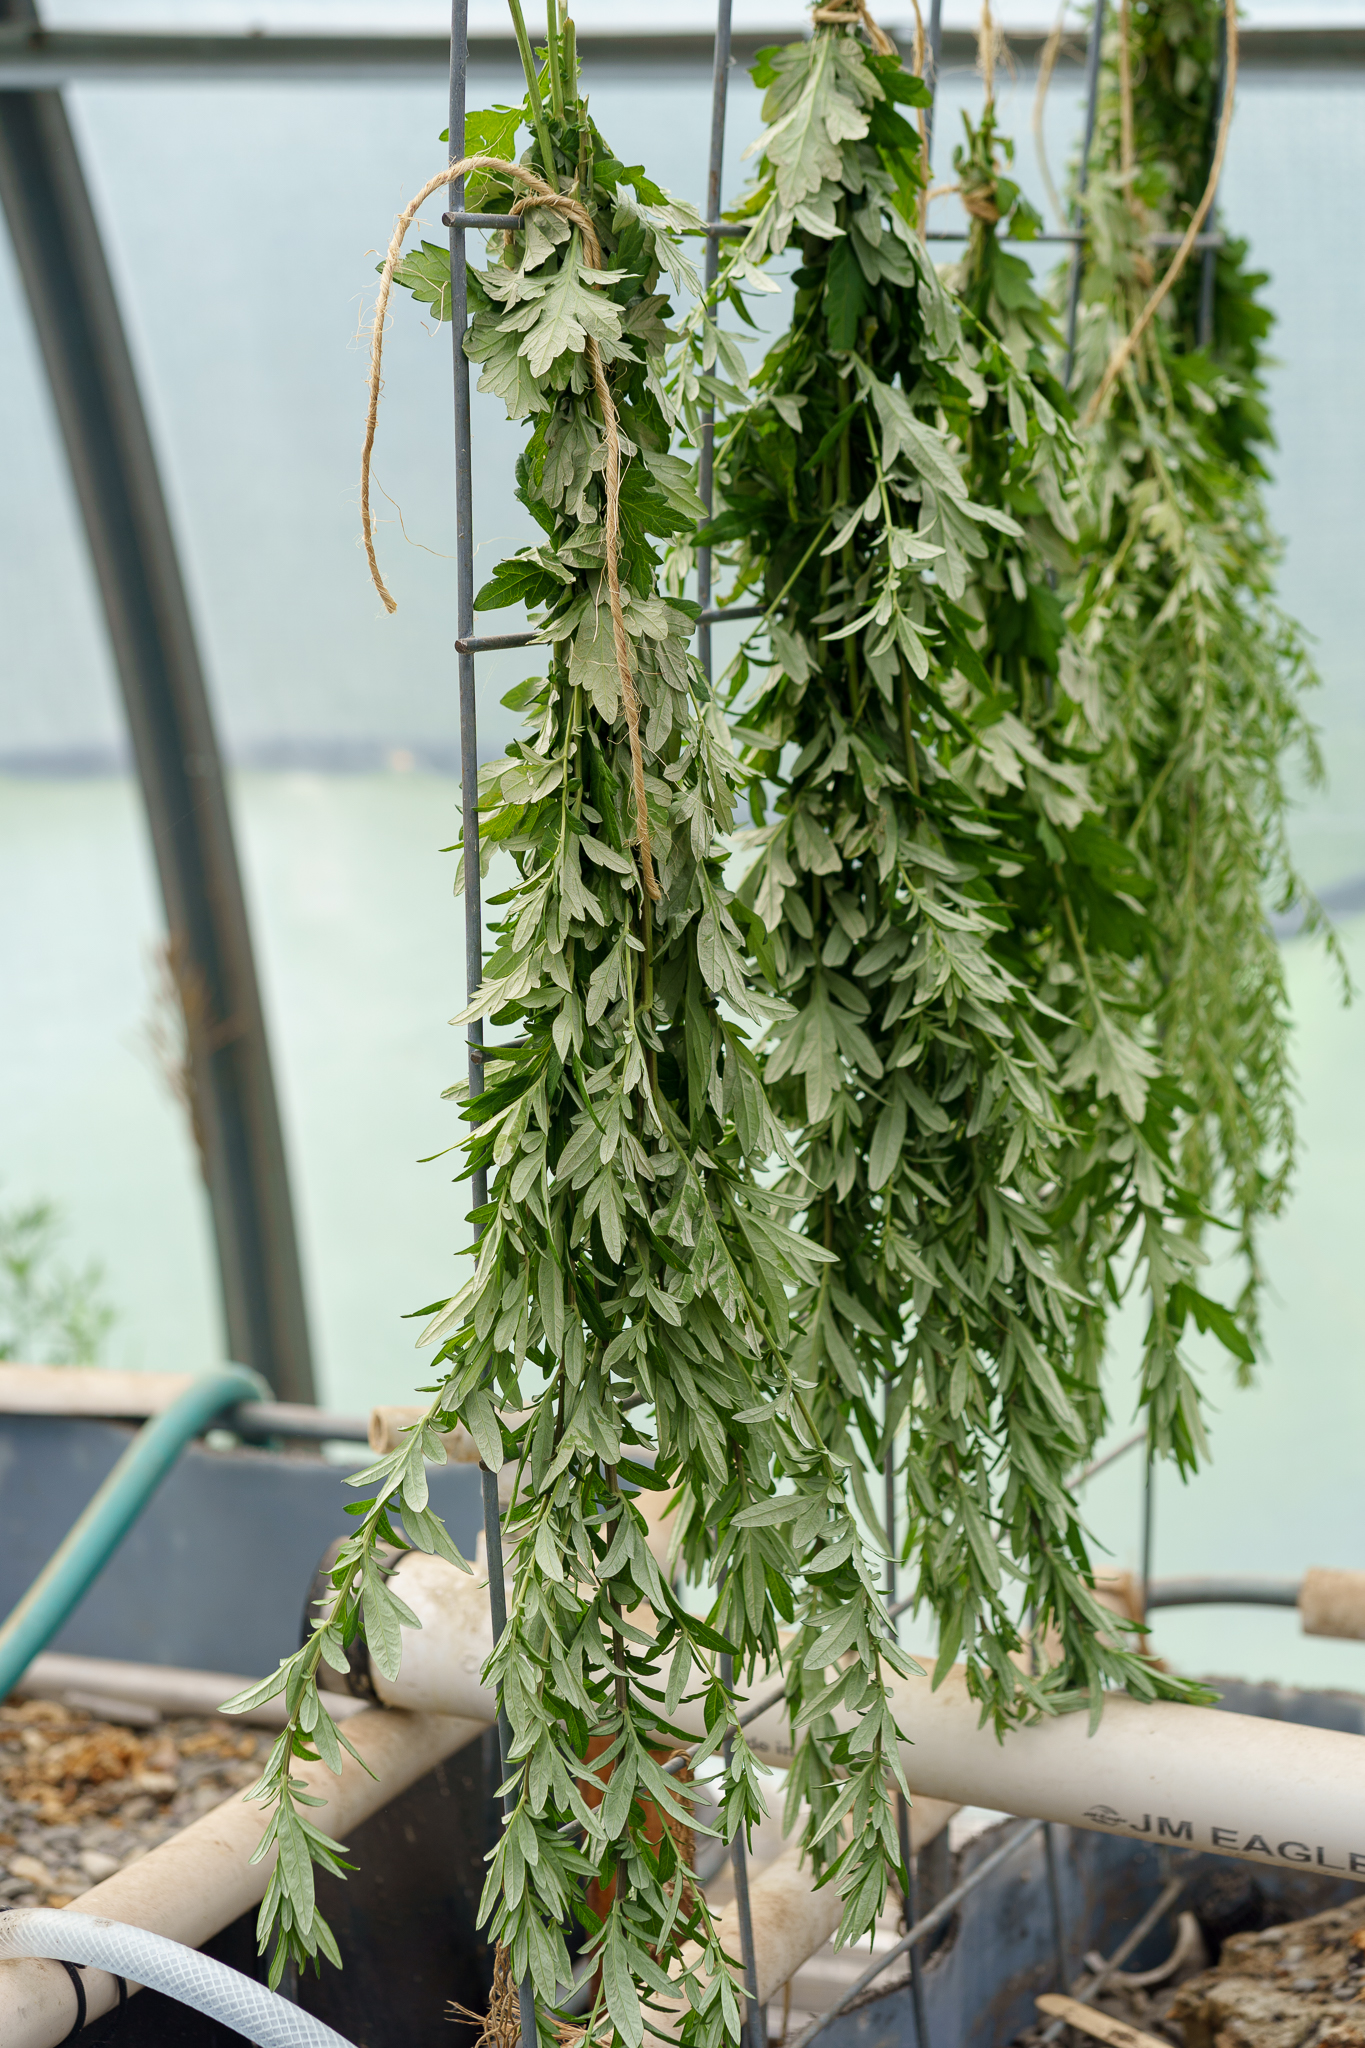 Garlic Planting and Herbal Remedies